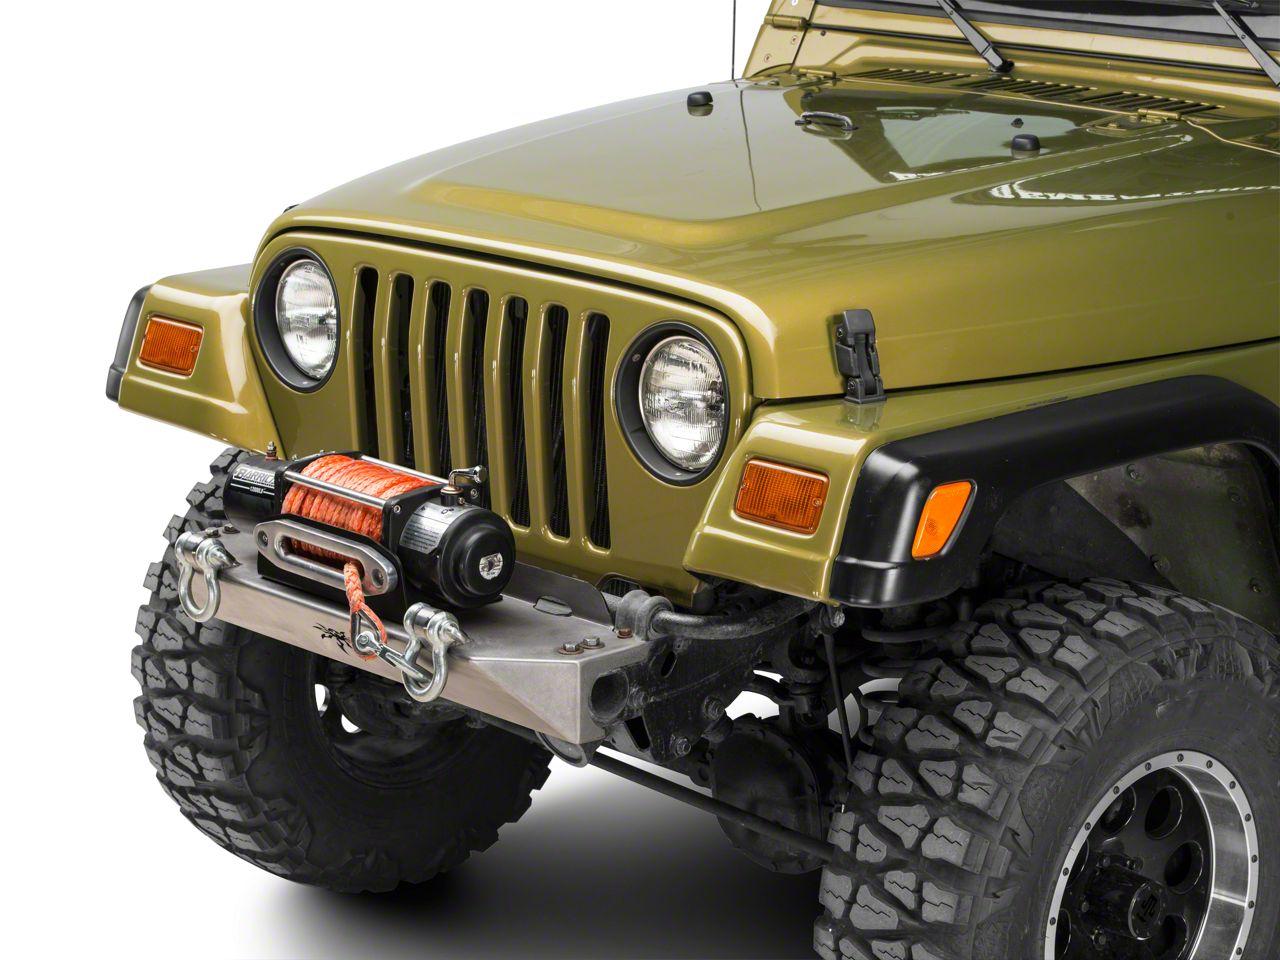 Poison Spyder BFH Front Bumper w/ Shackle Tabs - Bare Steel (97-06 Jeep Wrangler TJ)